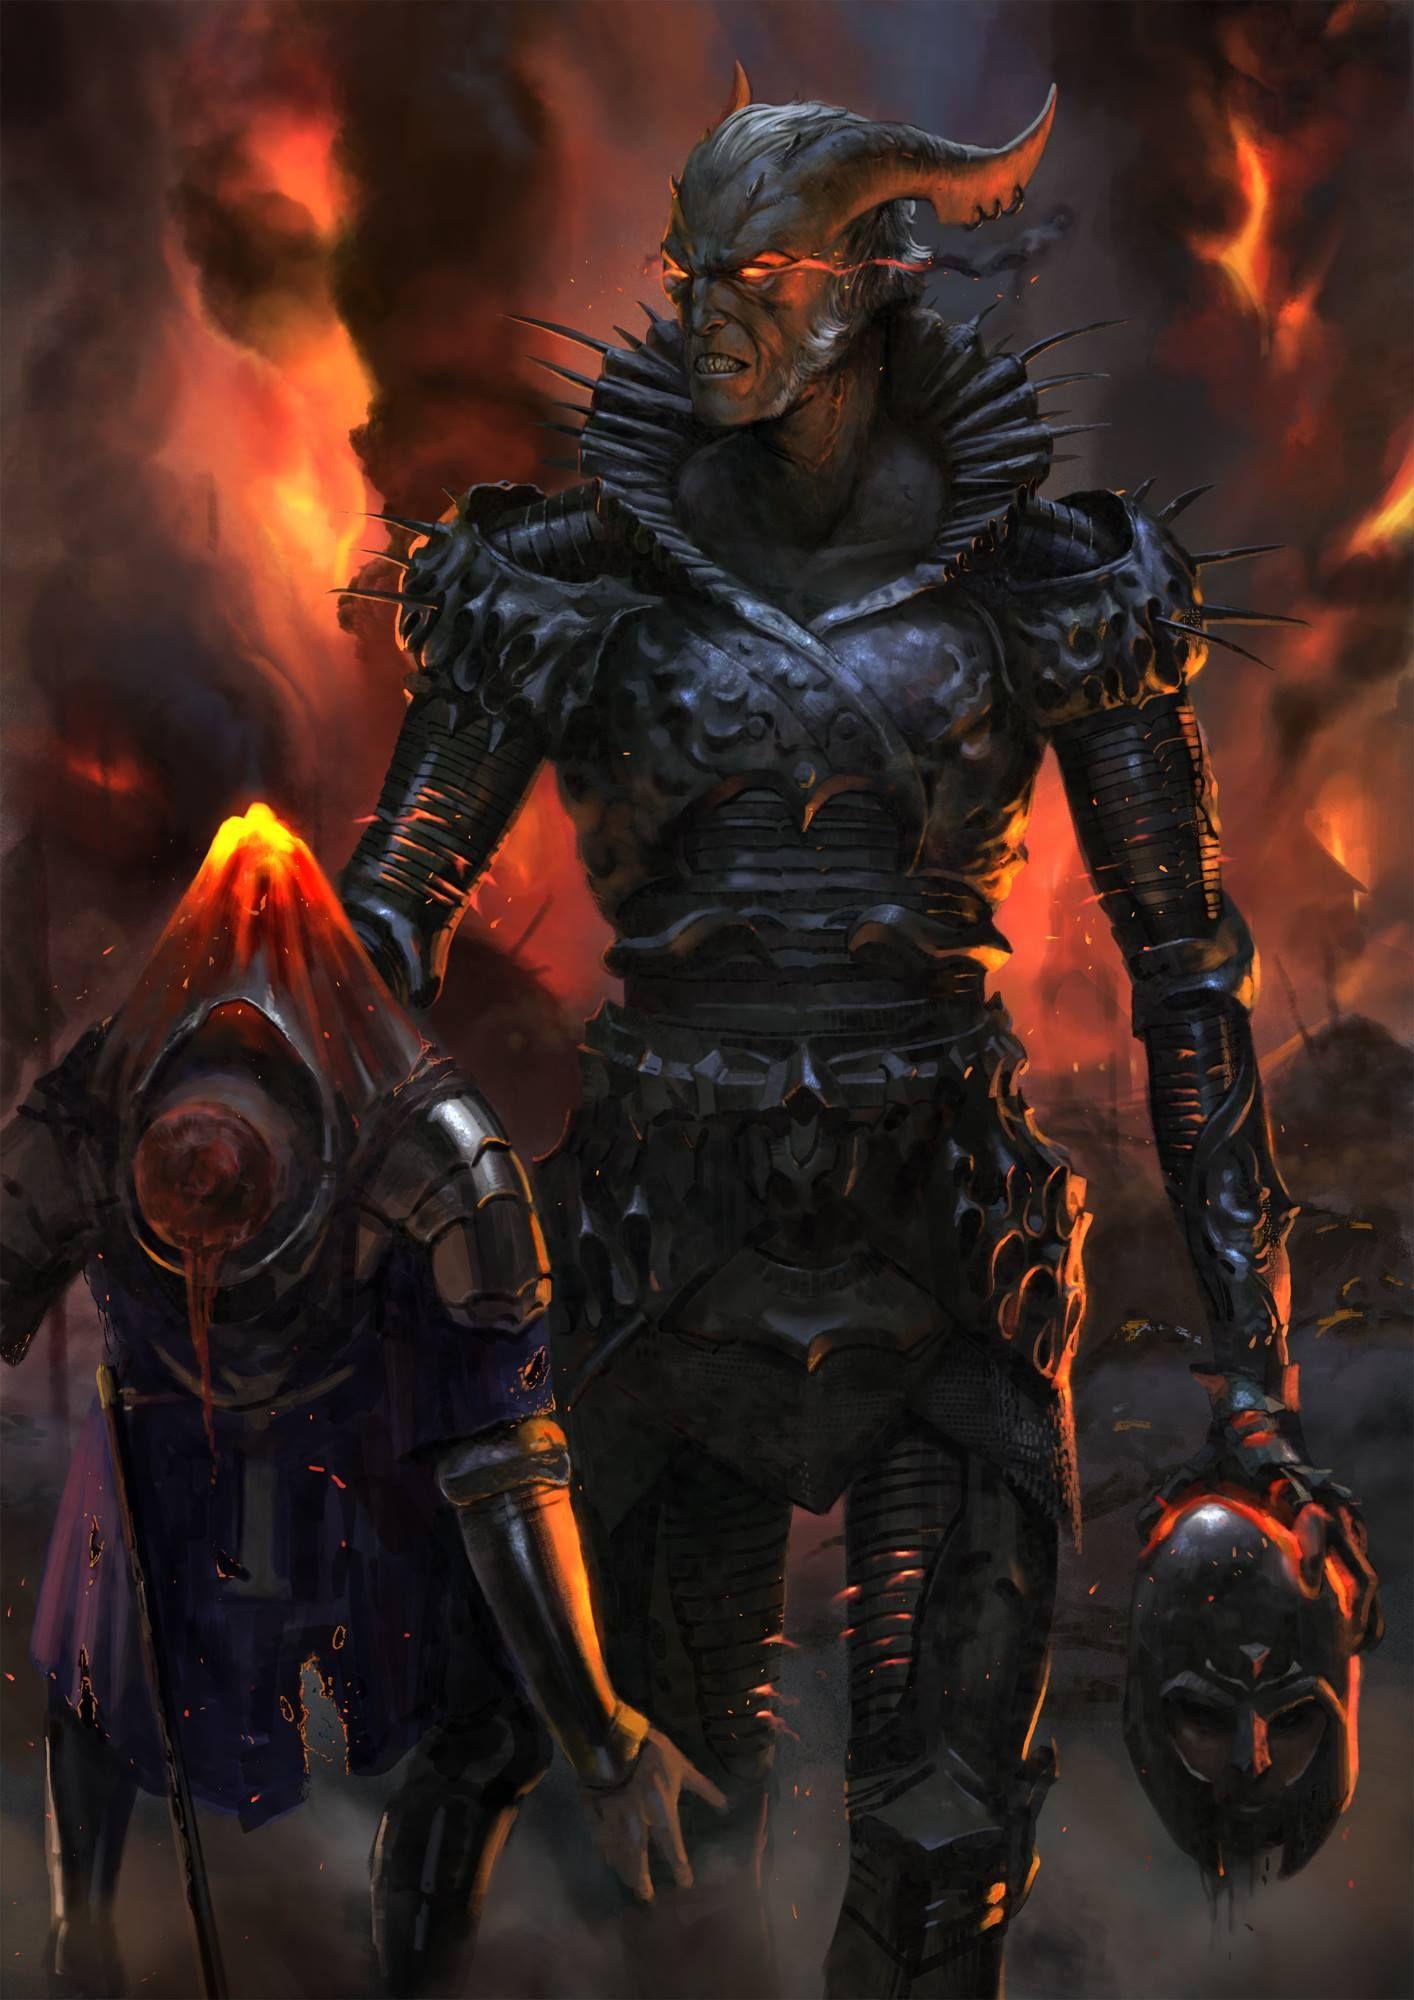 Dark Fantasy art on Behance